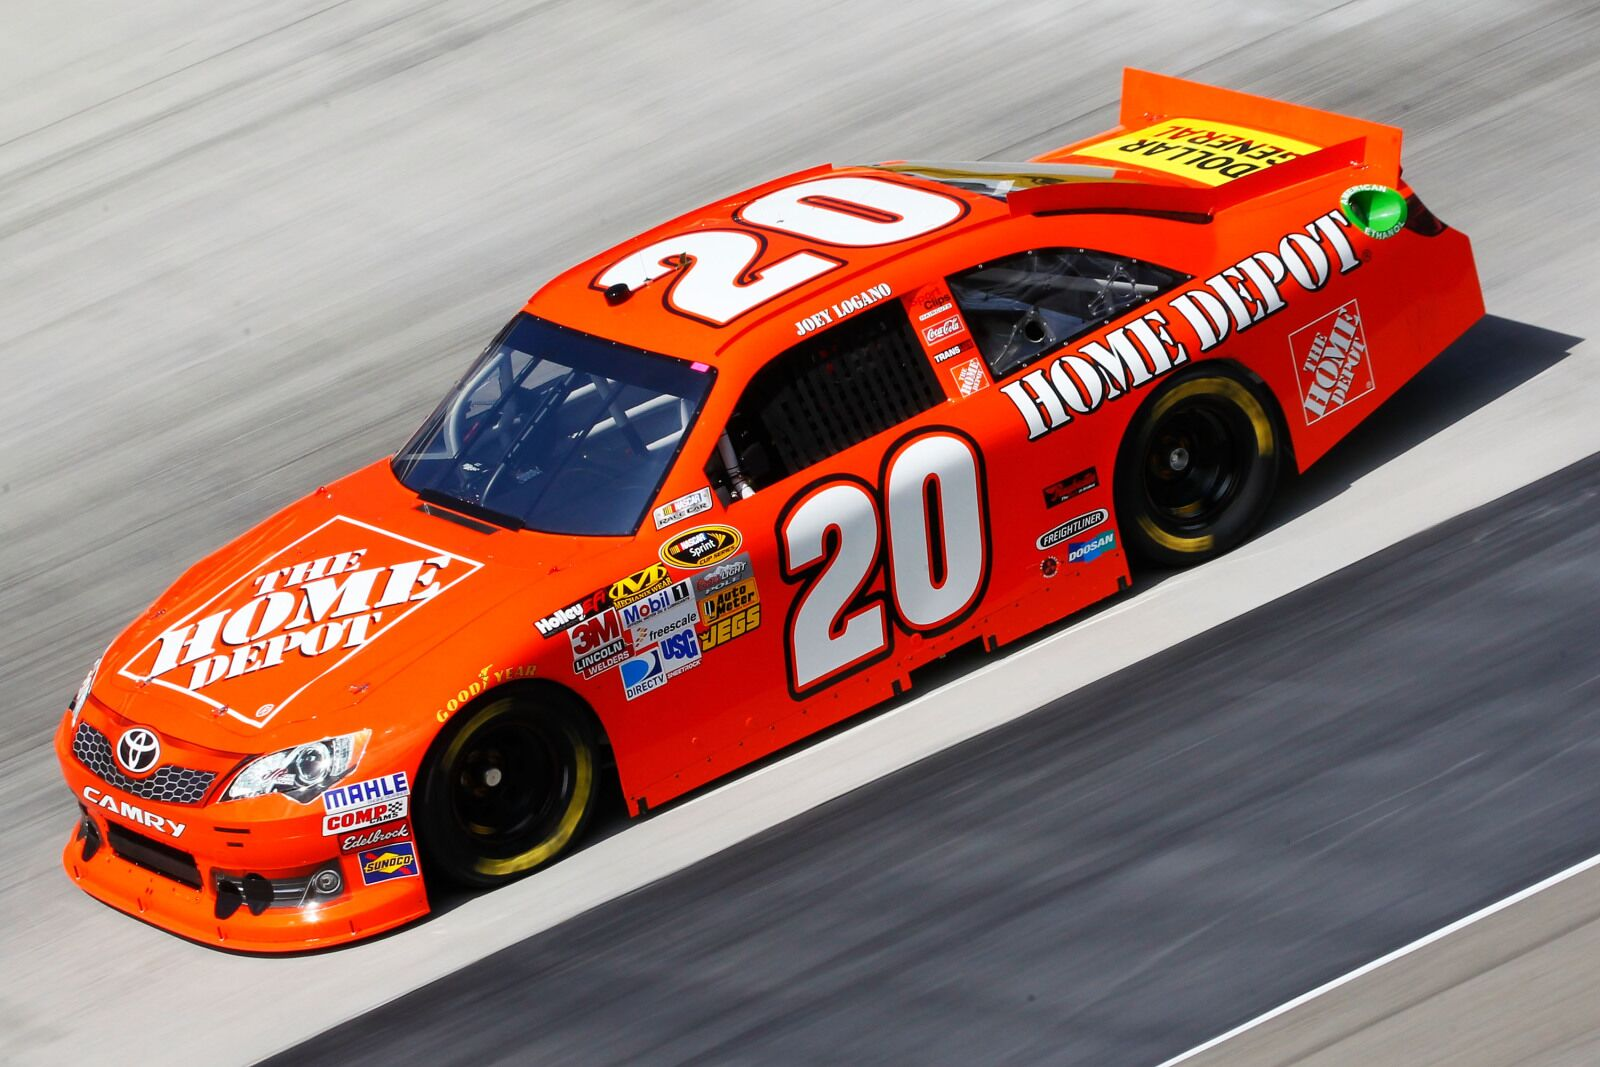 NASCAR: Will Daniel Suarez's split from Joe Gibbs Racing mirror Joey Logano's?